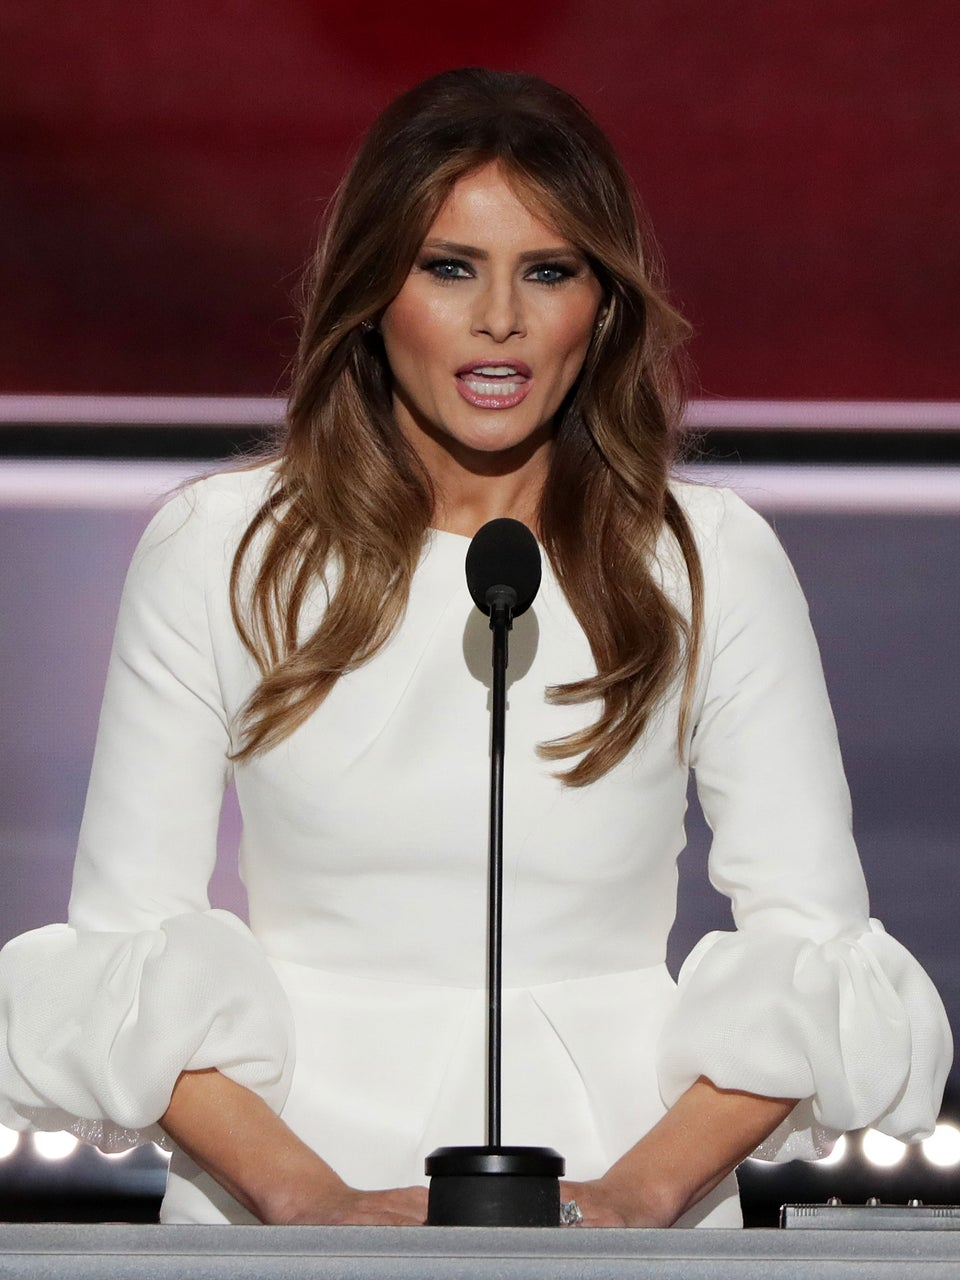 Melania Trump Accused Of Plagiarizing Michelle Obama's Speech